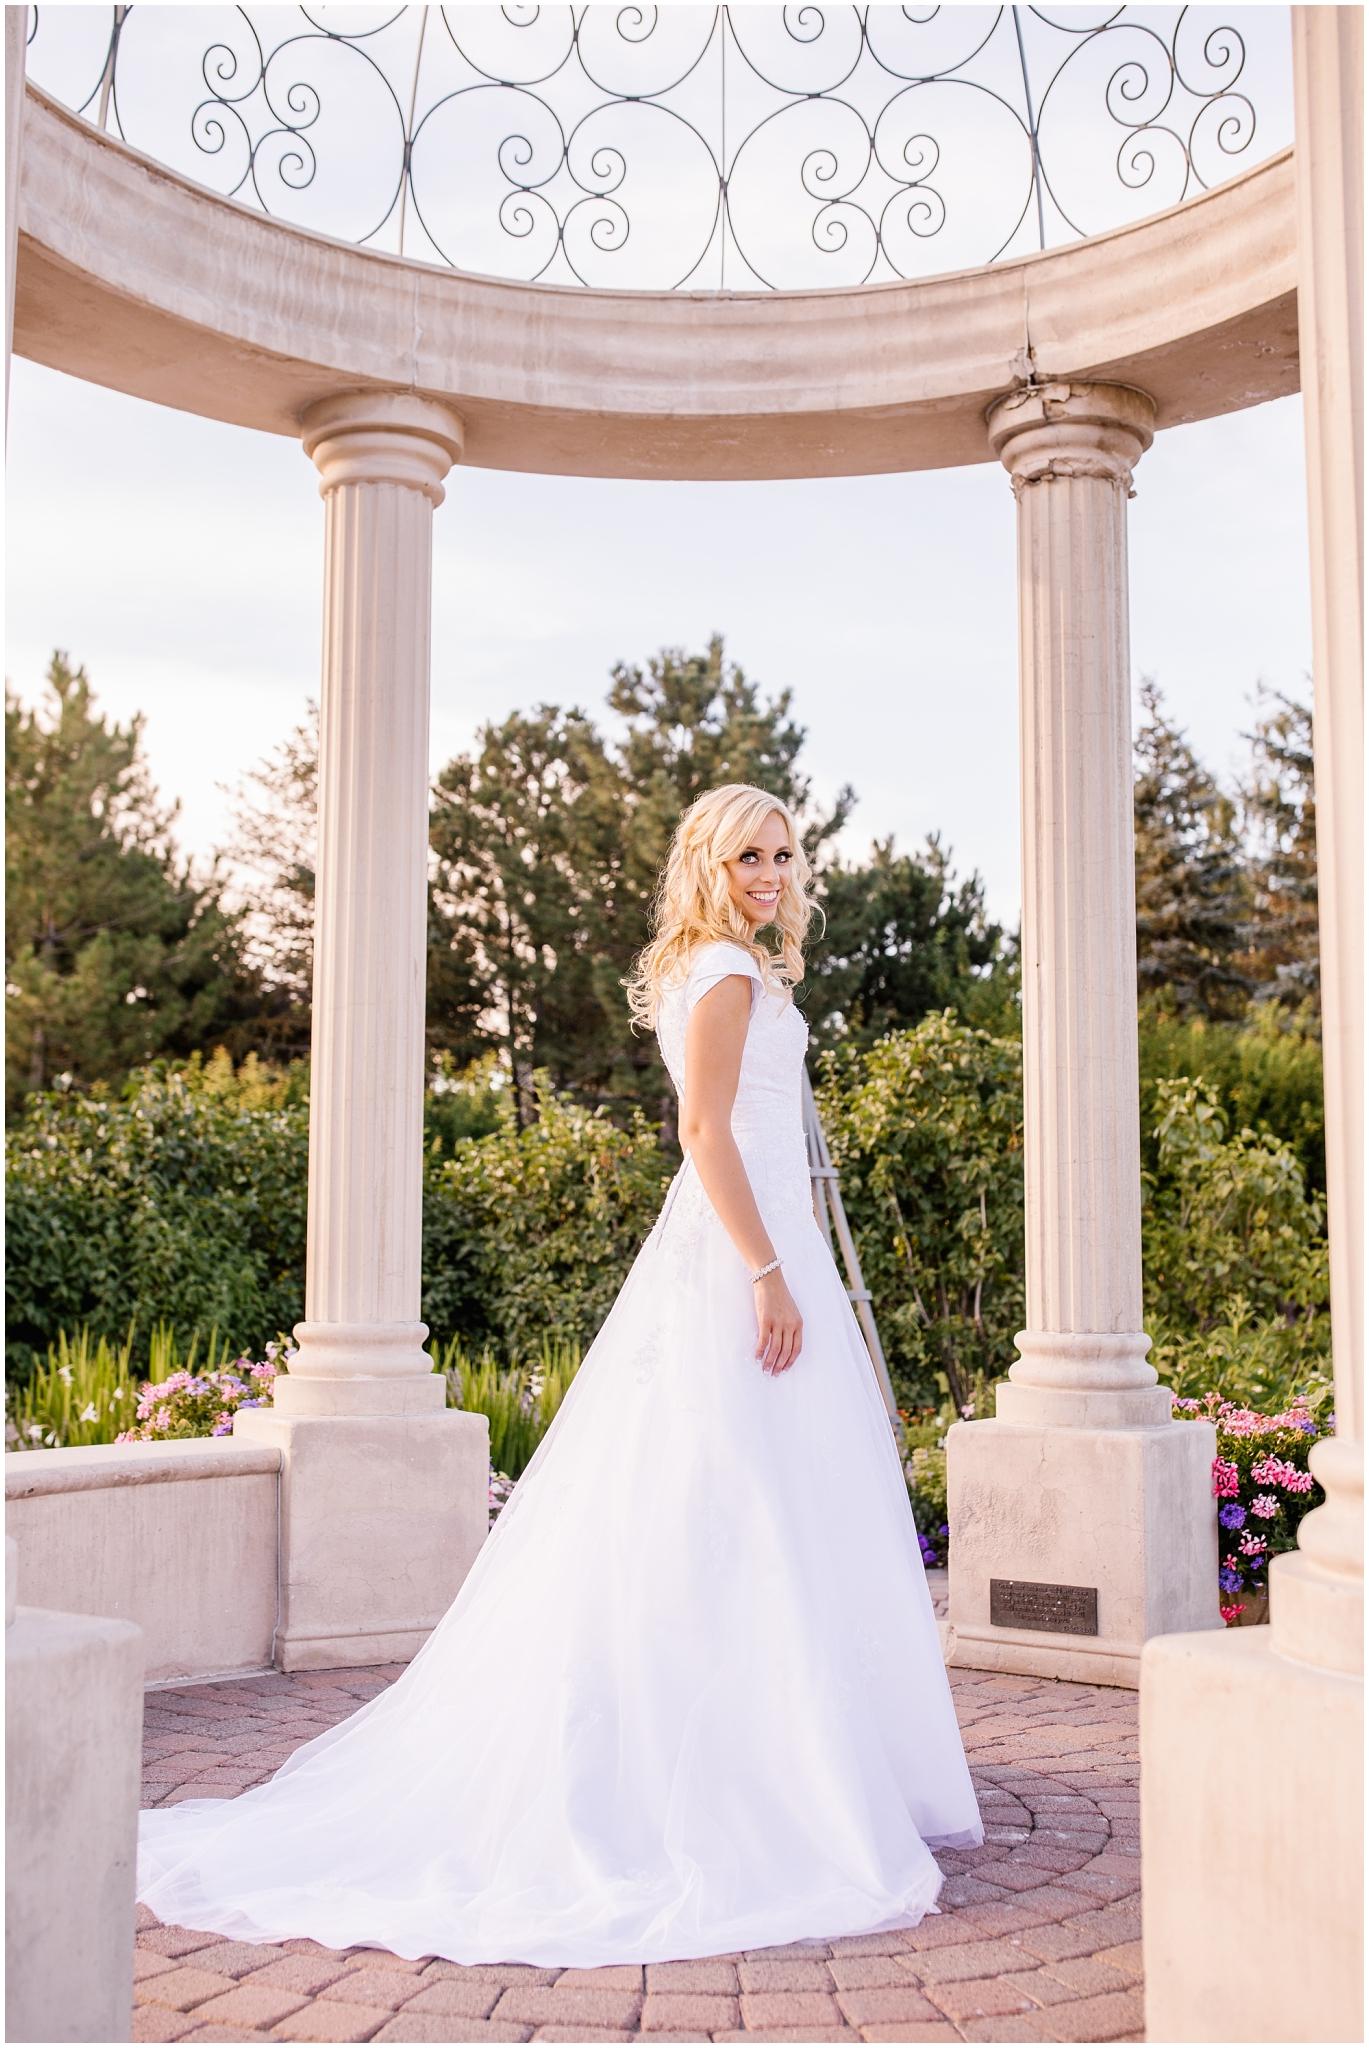 CHBridals-50_Lizzie-B-Imagery-Utah-Wedding-Photographer-Salt-Lake-City-Park-City-Thanksgiving-Point-Ashton-Gardens.jpg